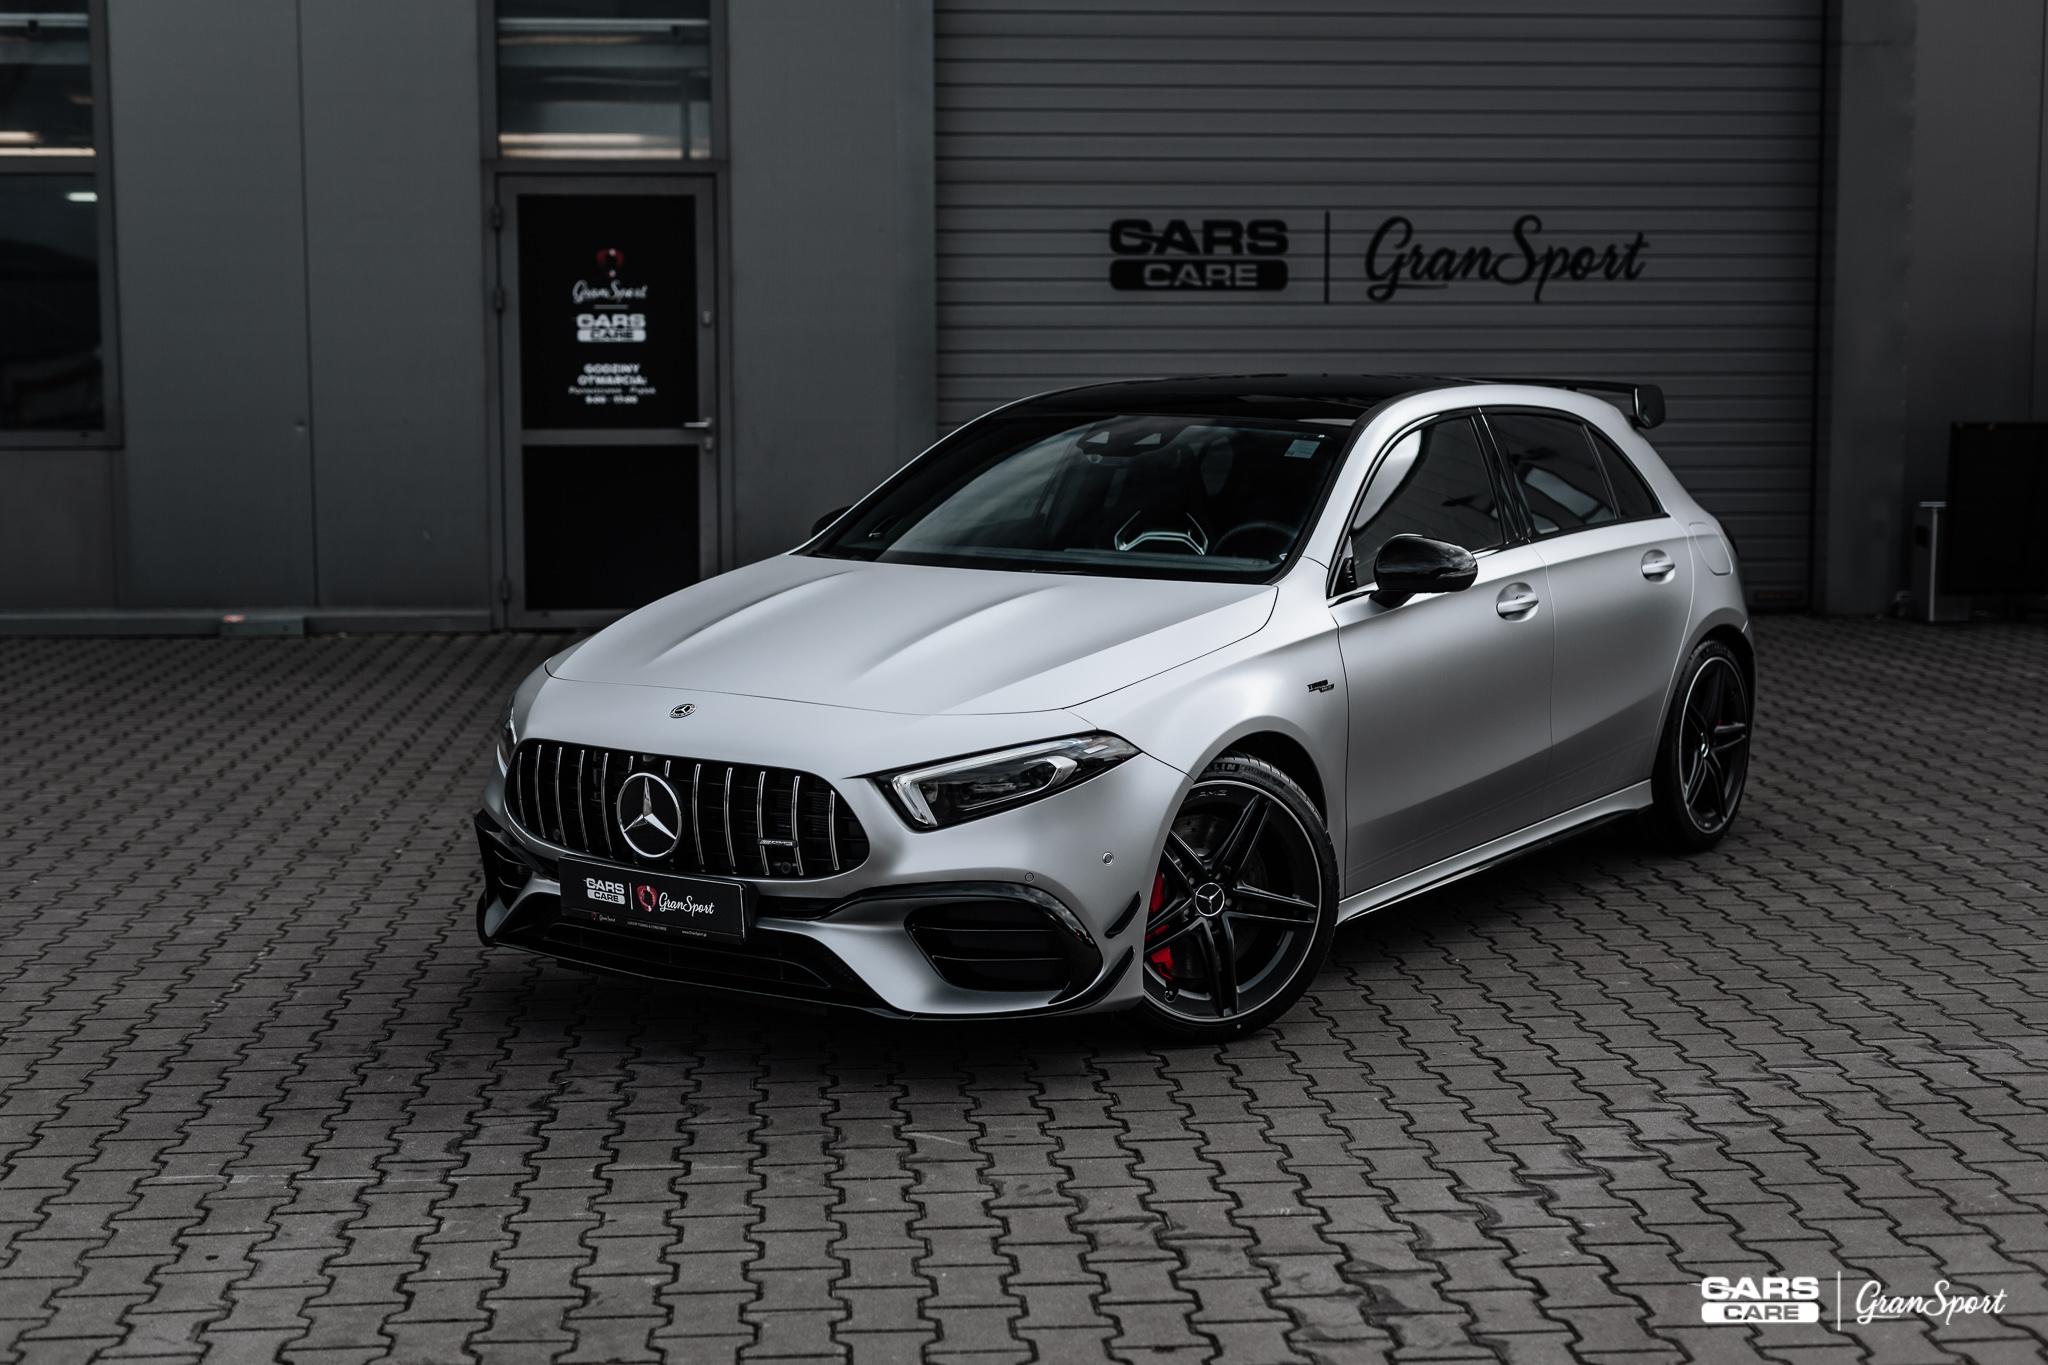 Mercedes-AMG A45 S - Zmiana koloru auta folią - carscare.pl